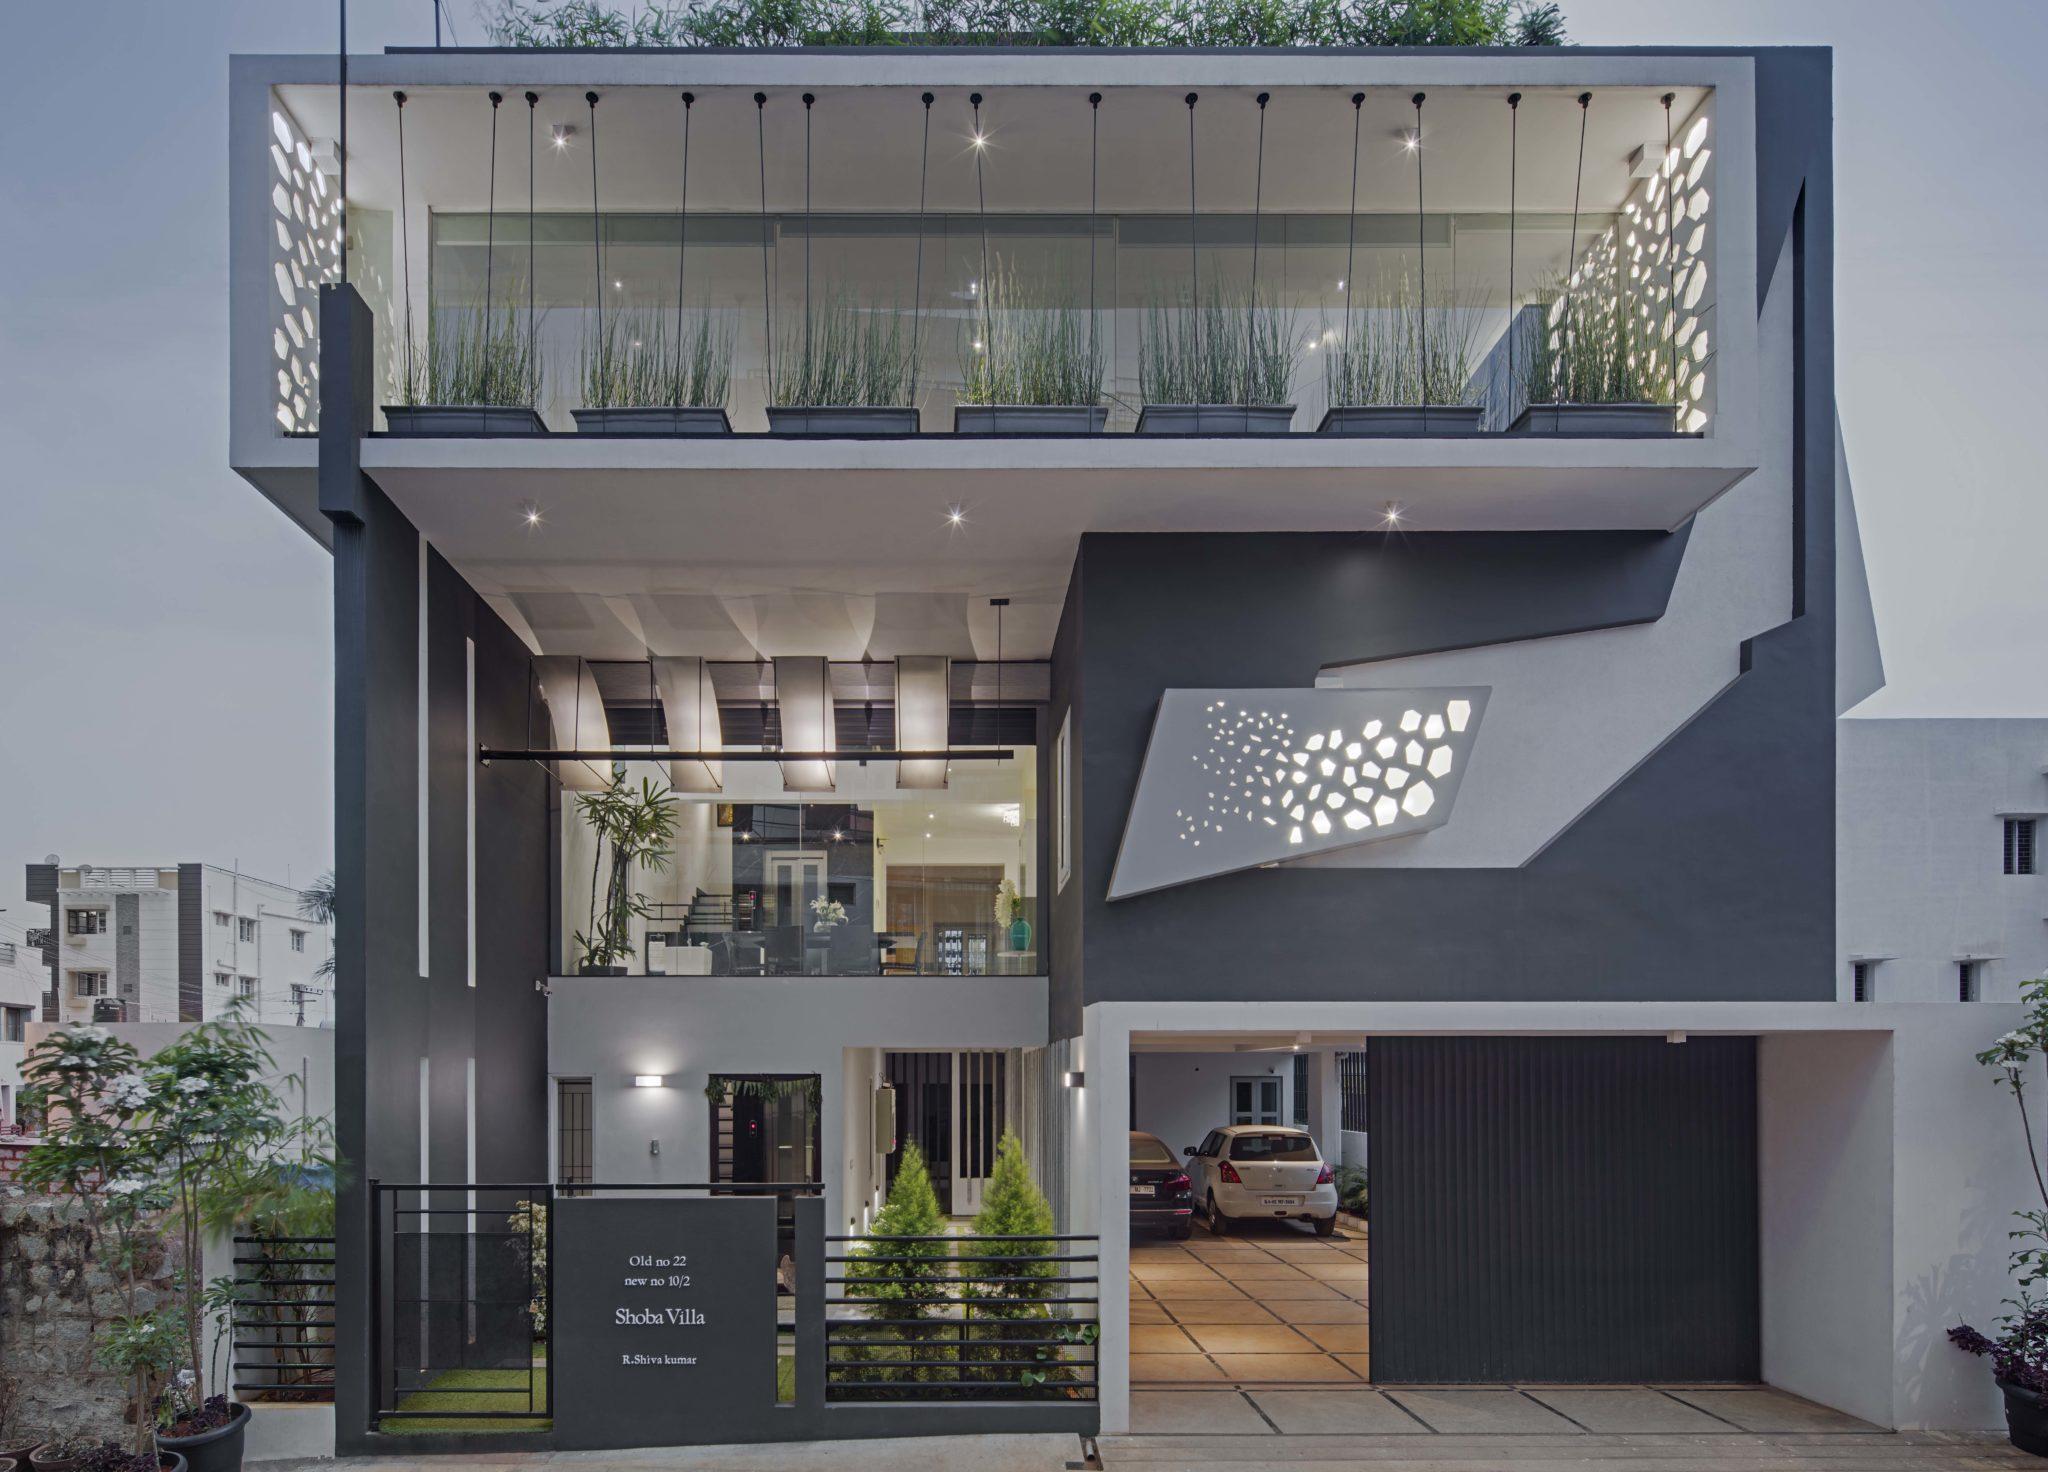 elevation designs front elevation of house | house elevation design india | house design WQSOOVM